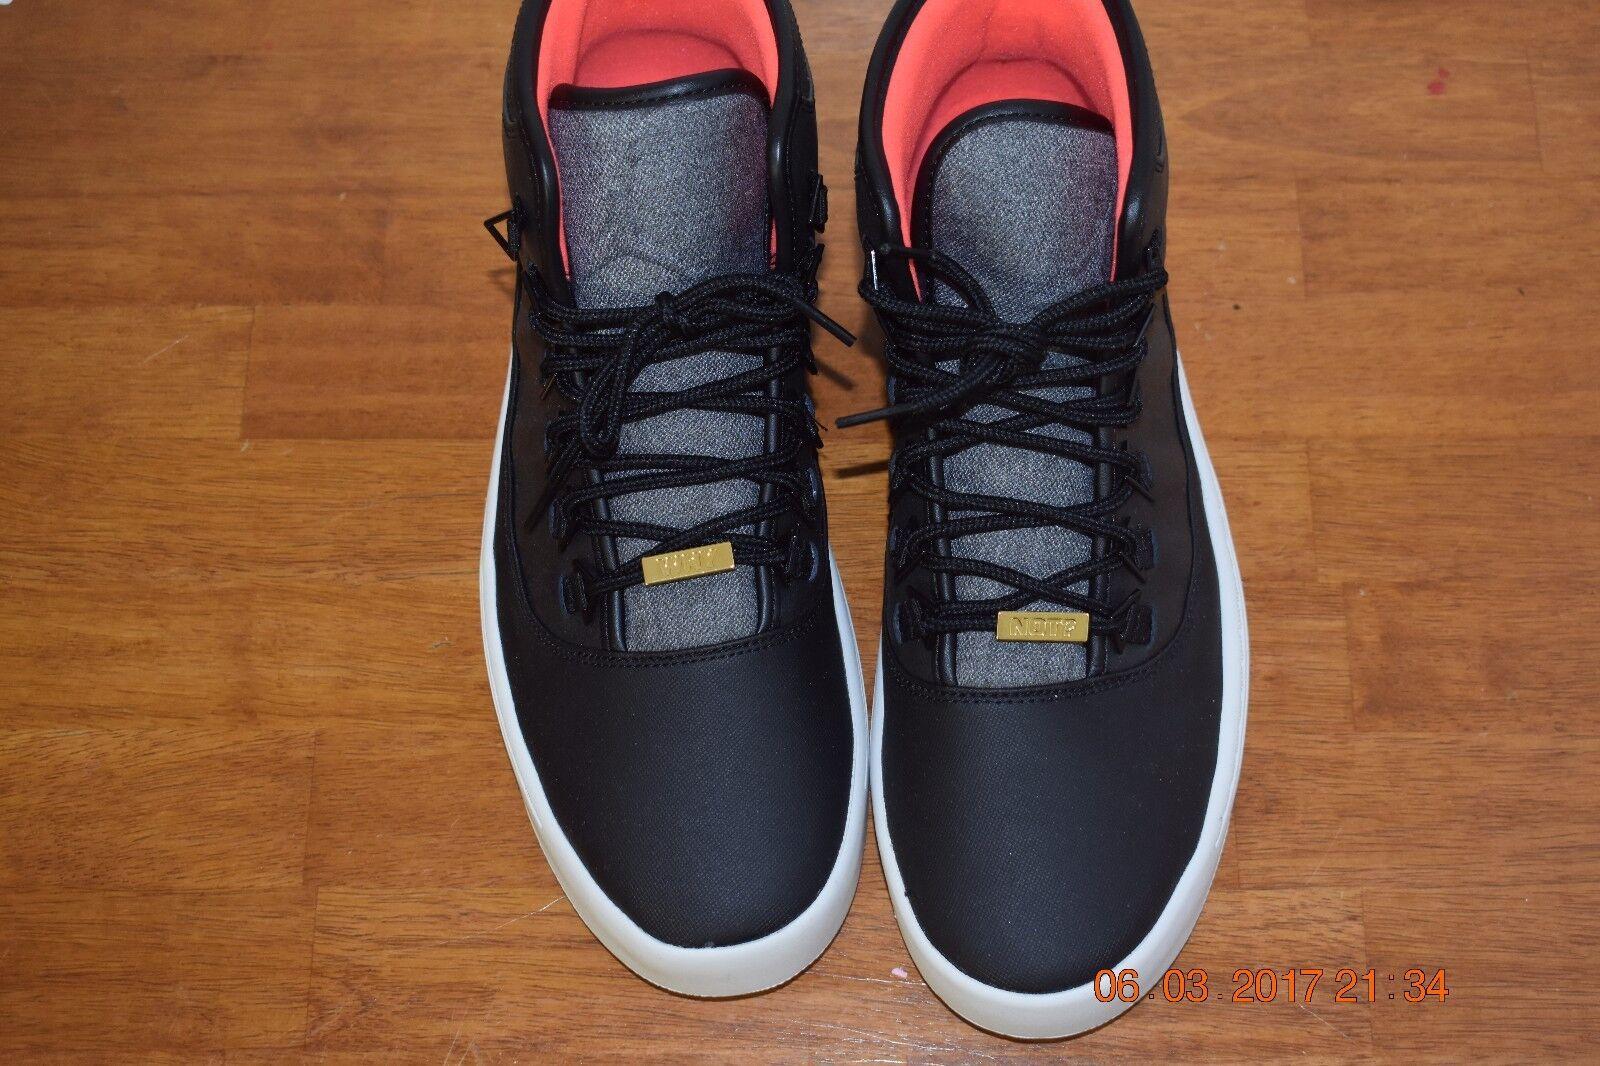 Nike Jordan Westbrook O Holiday Black Infrared 23 Light Bone. 812877-025 Cheap and beautiful fashion